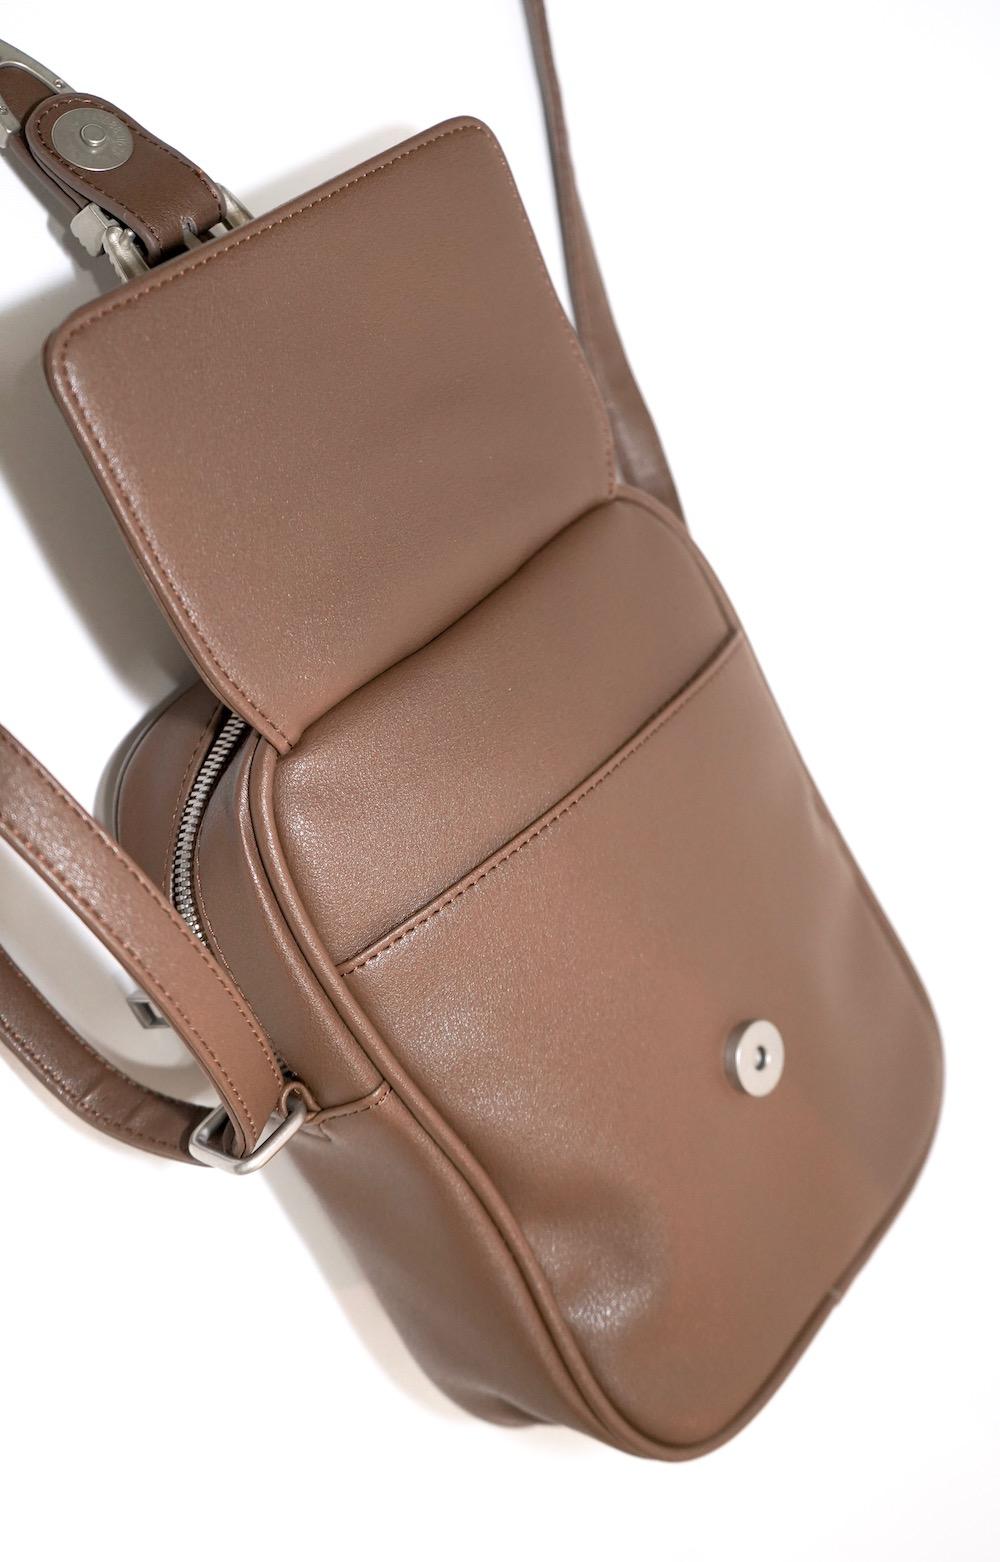 Emboss Buckle Shoulder Bag (light brown)